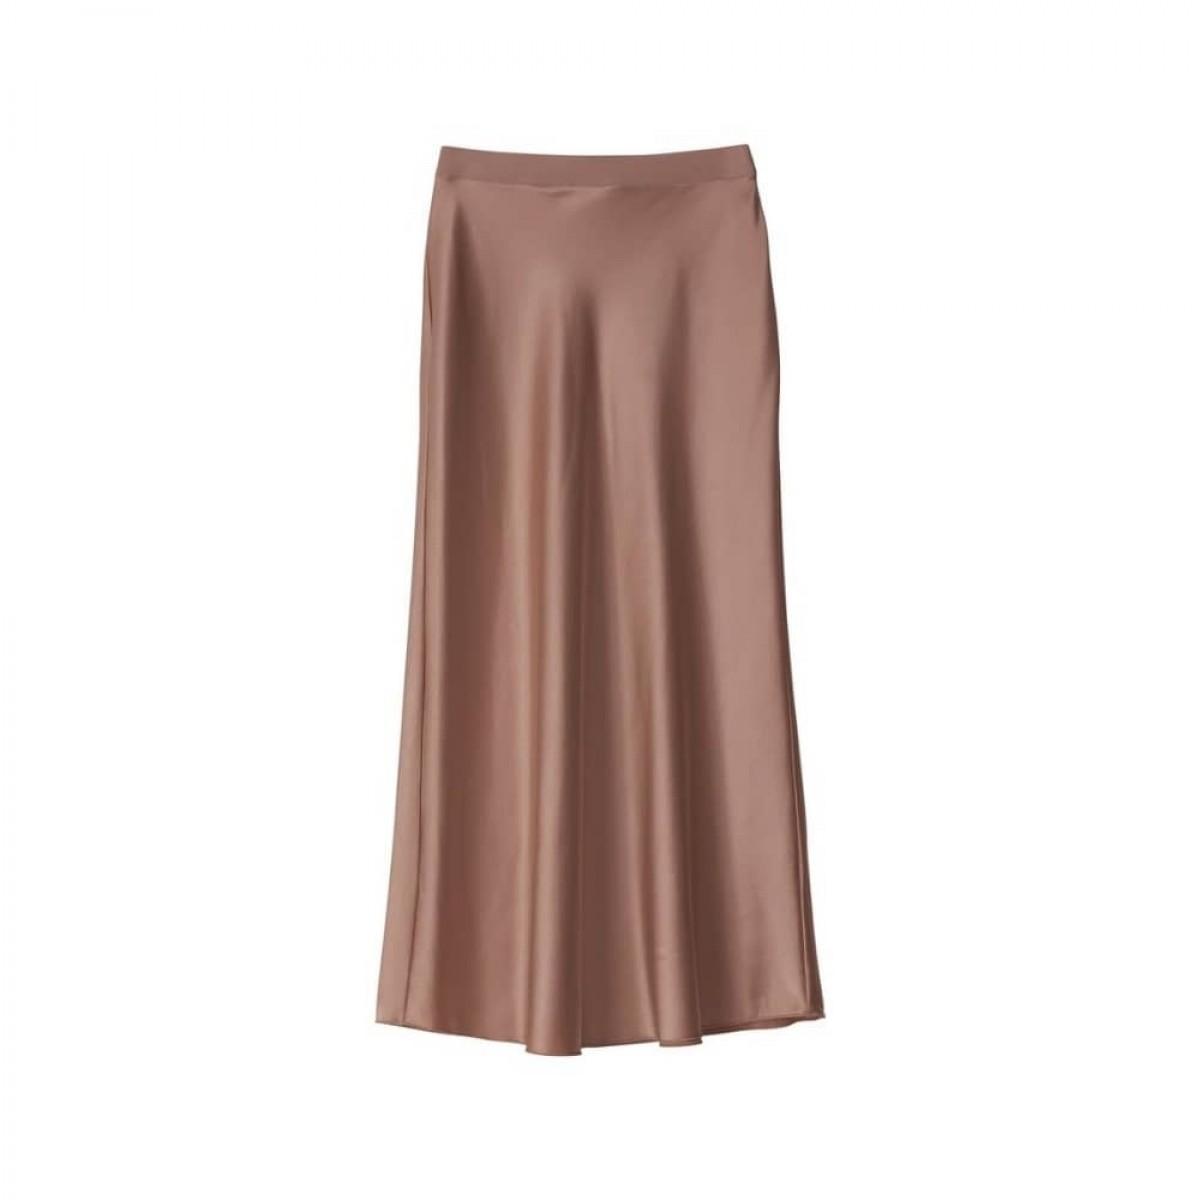 hana nederdel - sand - front